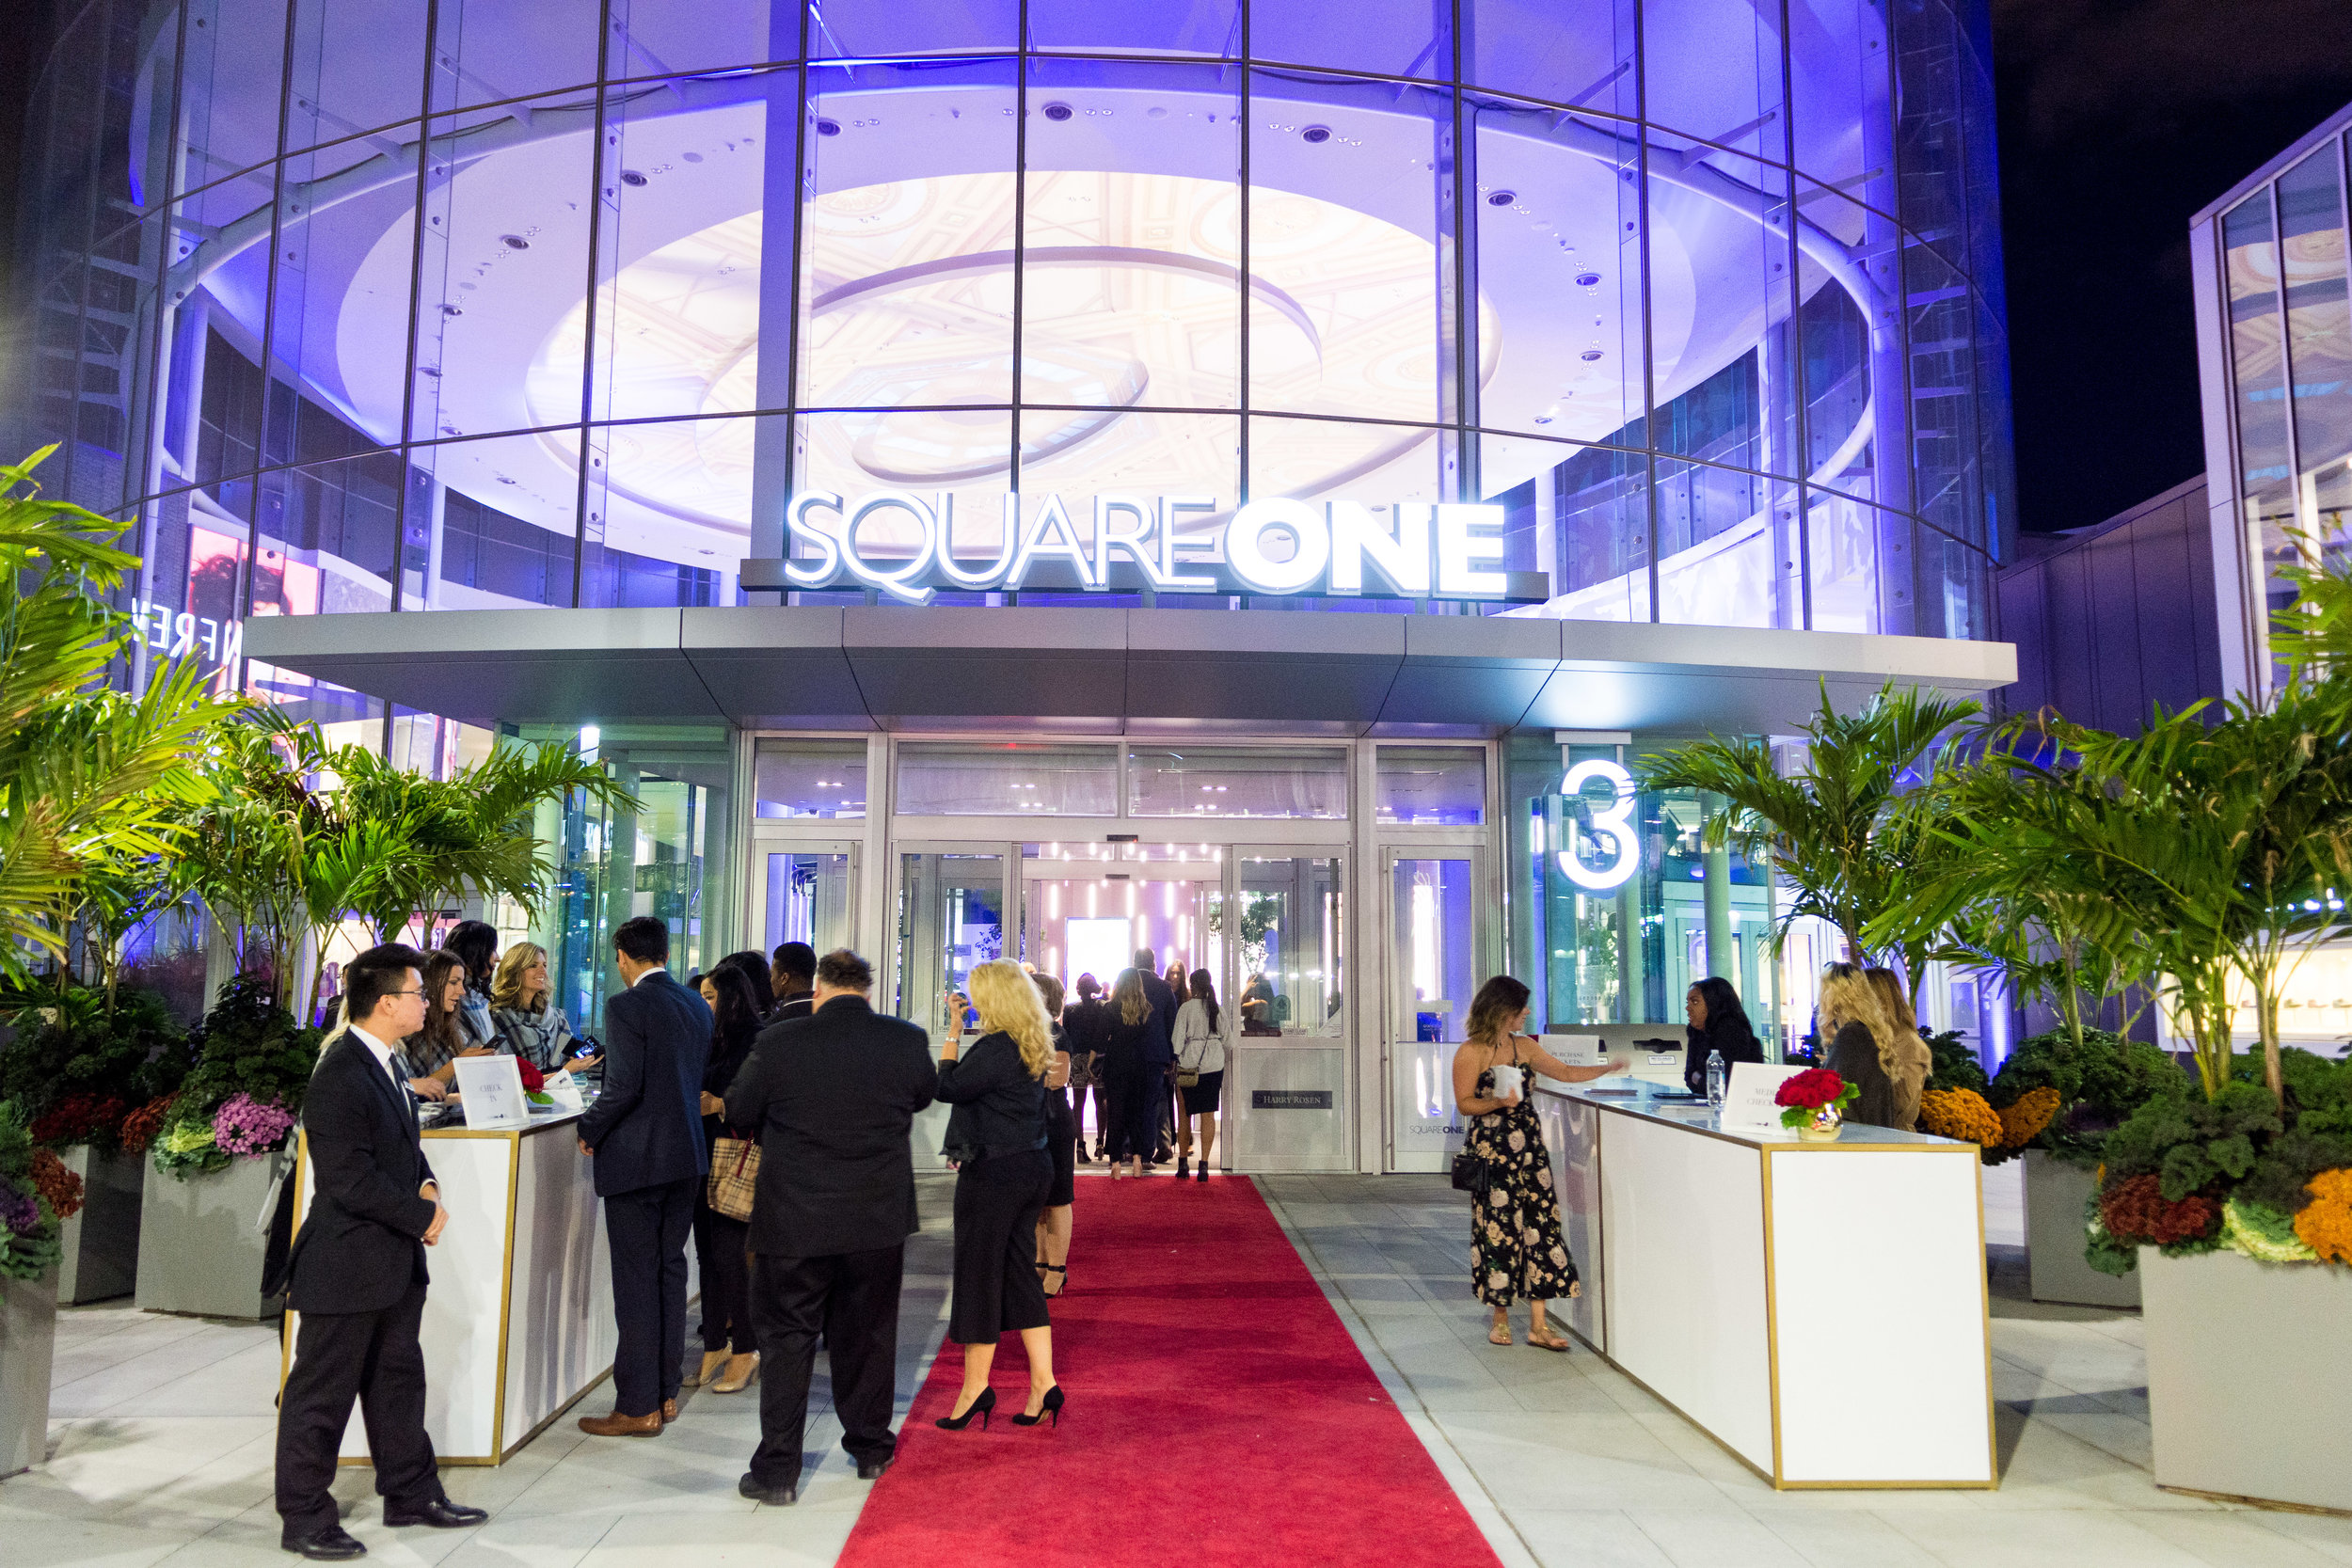 La Dolce Vita Square One Sep 28, 2017-2.jpg